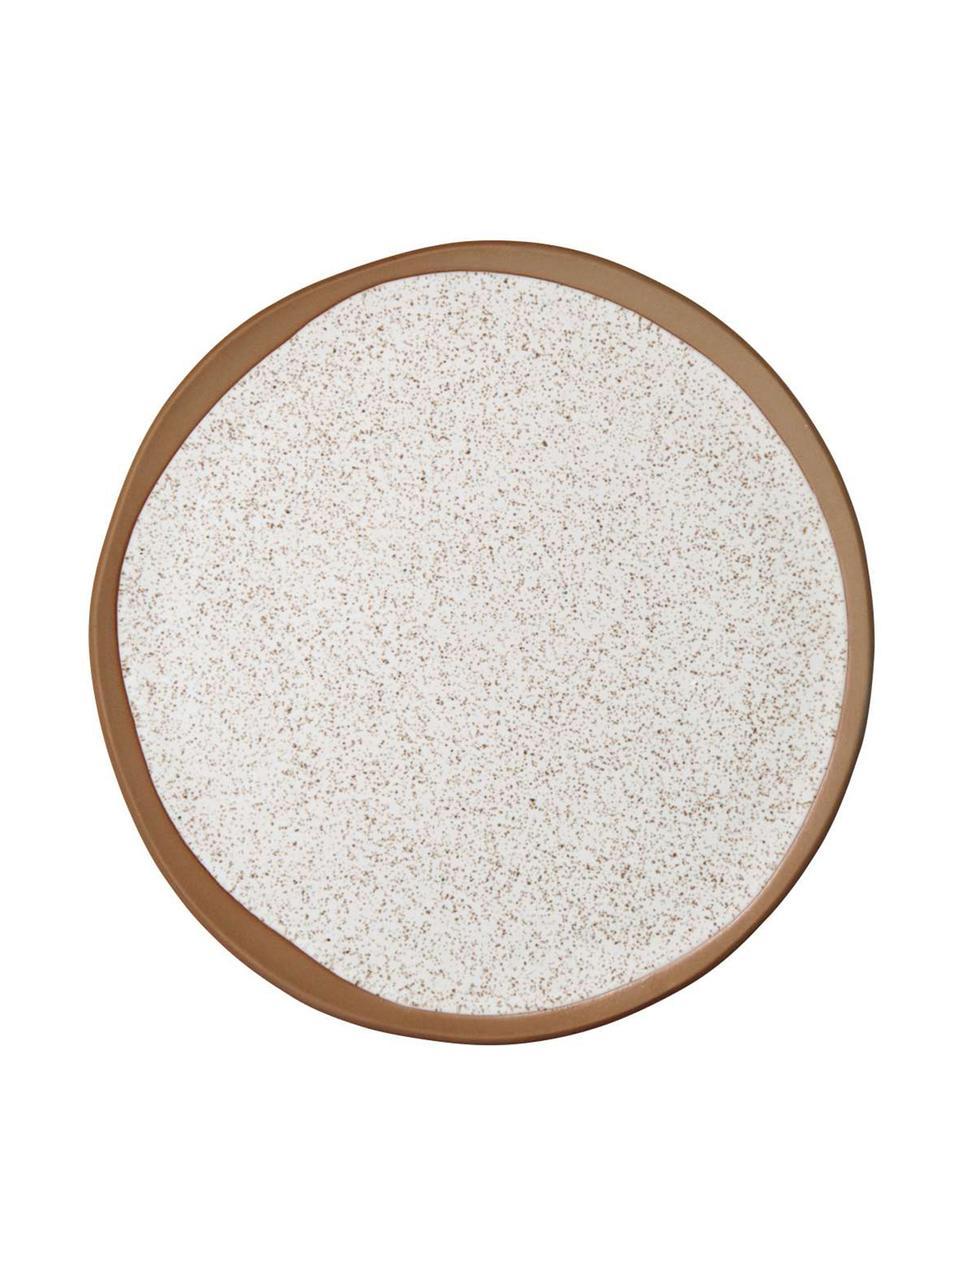 Piattino da dessert marrone/beige opaco Caja 2 pz, Gres, Tonalità marroni e beige, Ø 21 cm